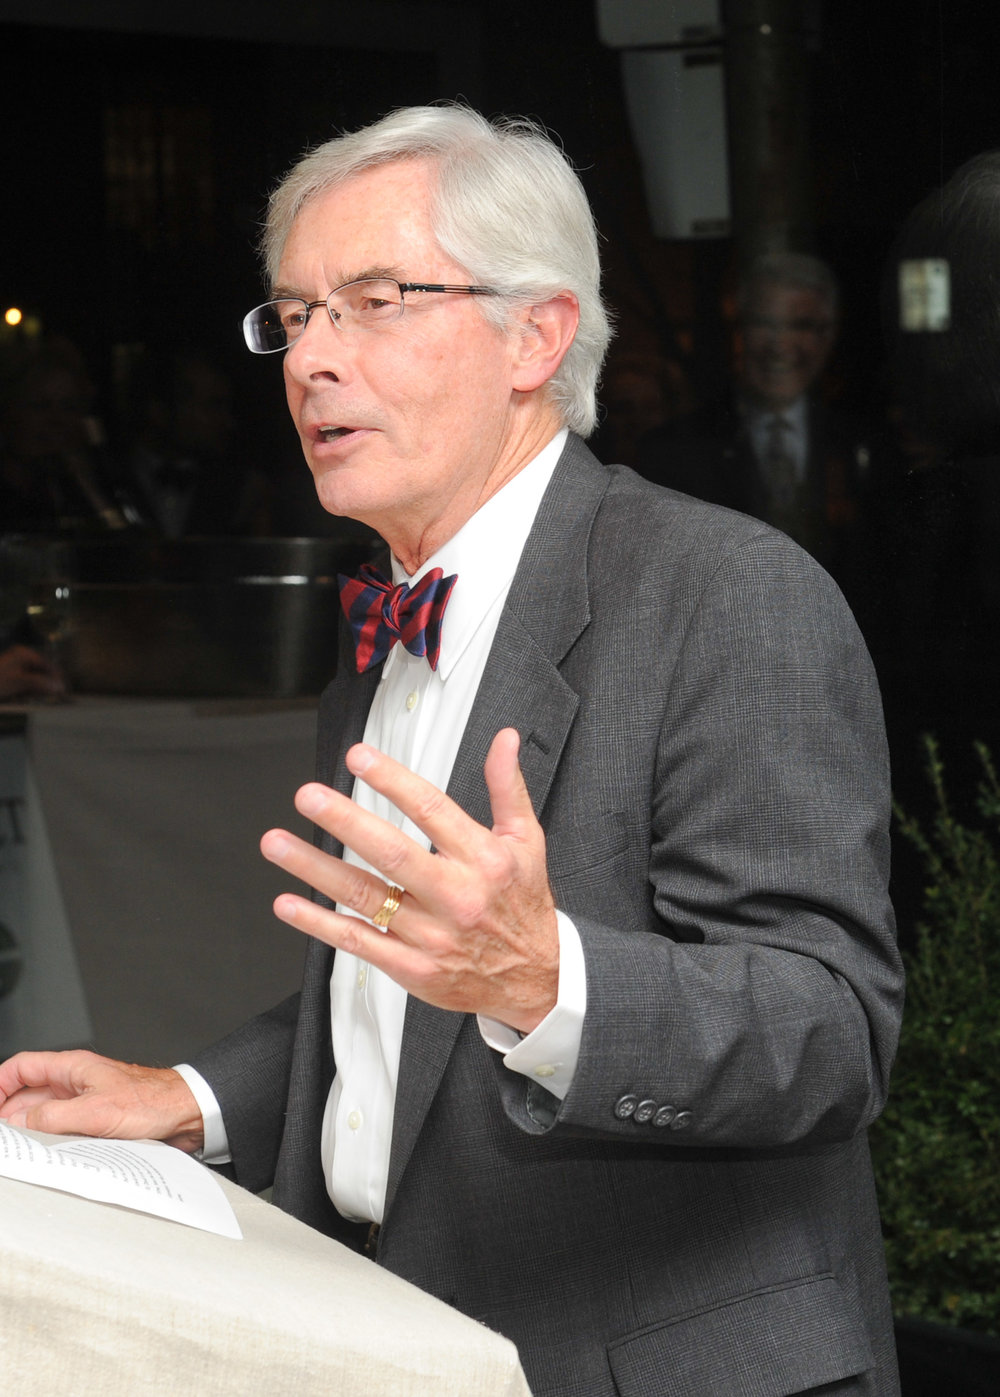 Dr. Reed E. Pyeritz